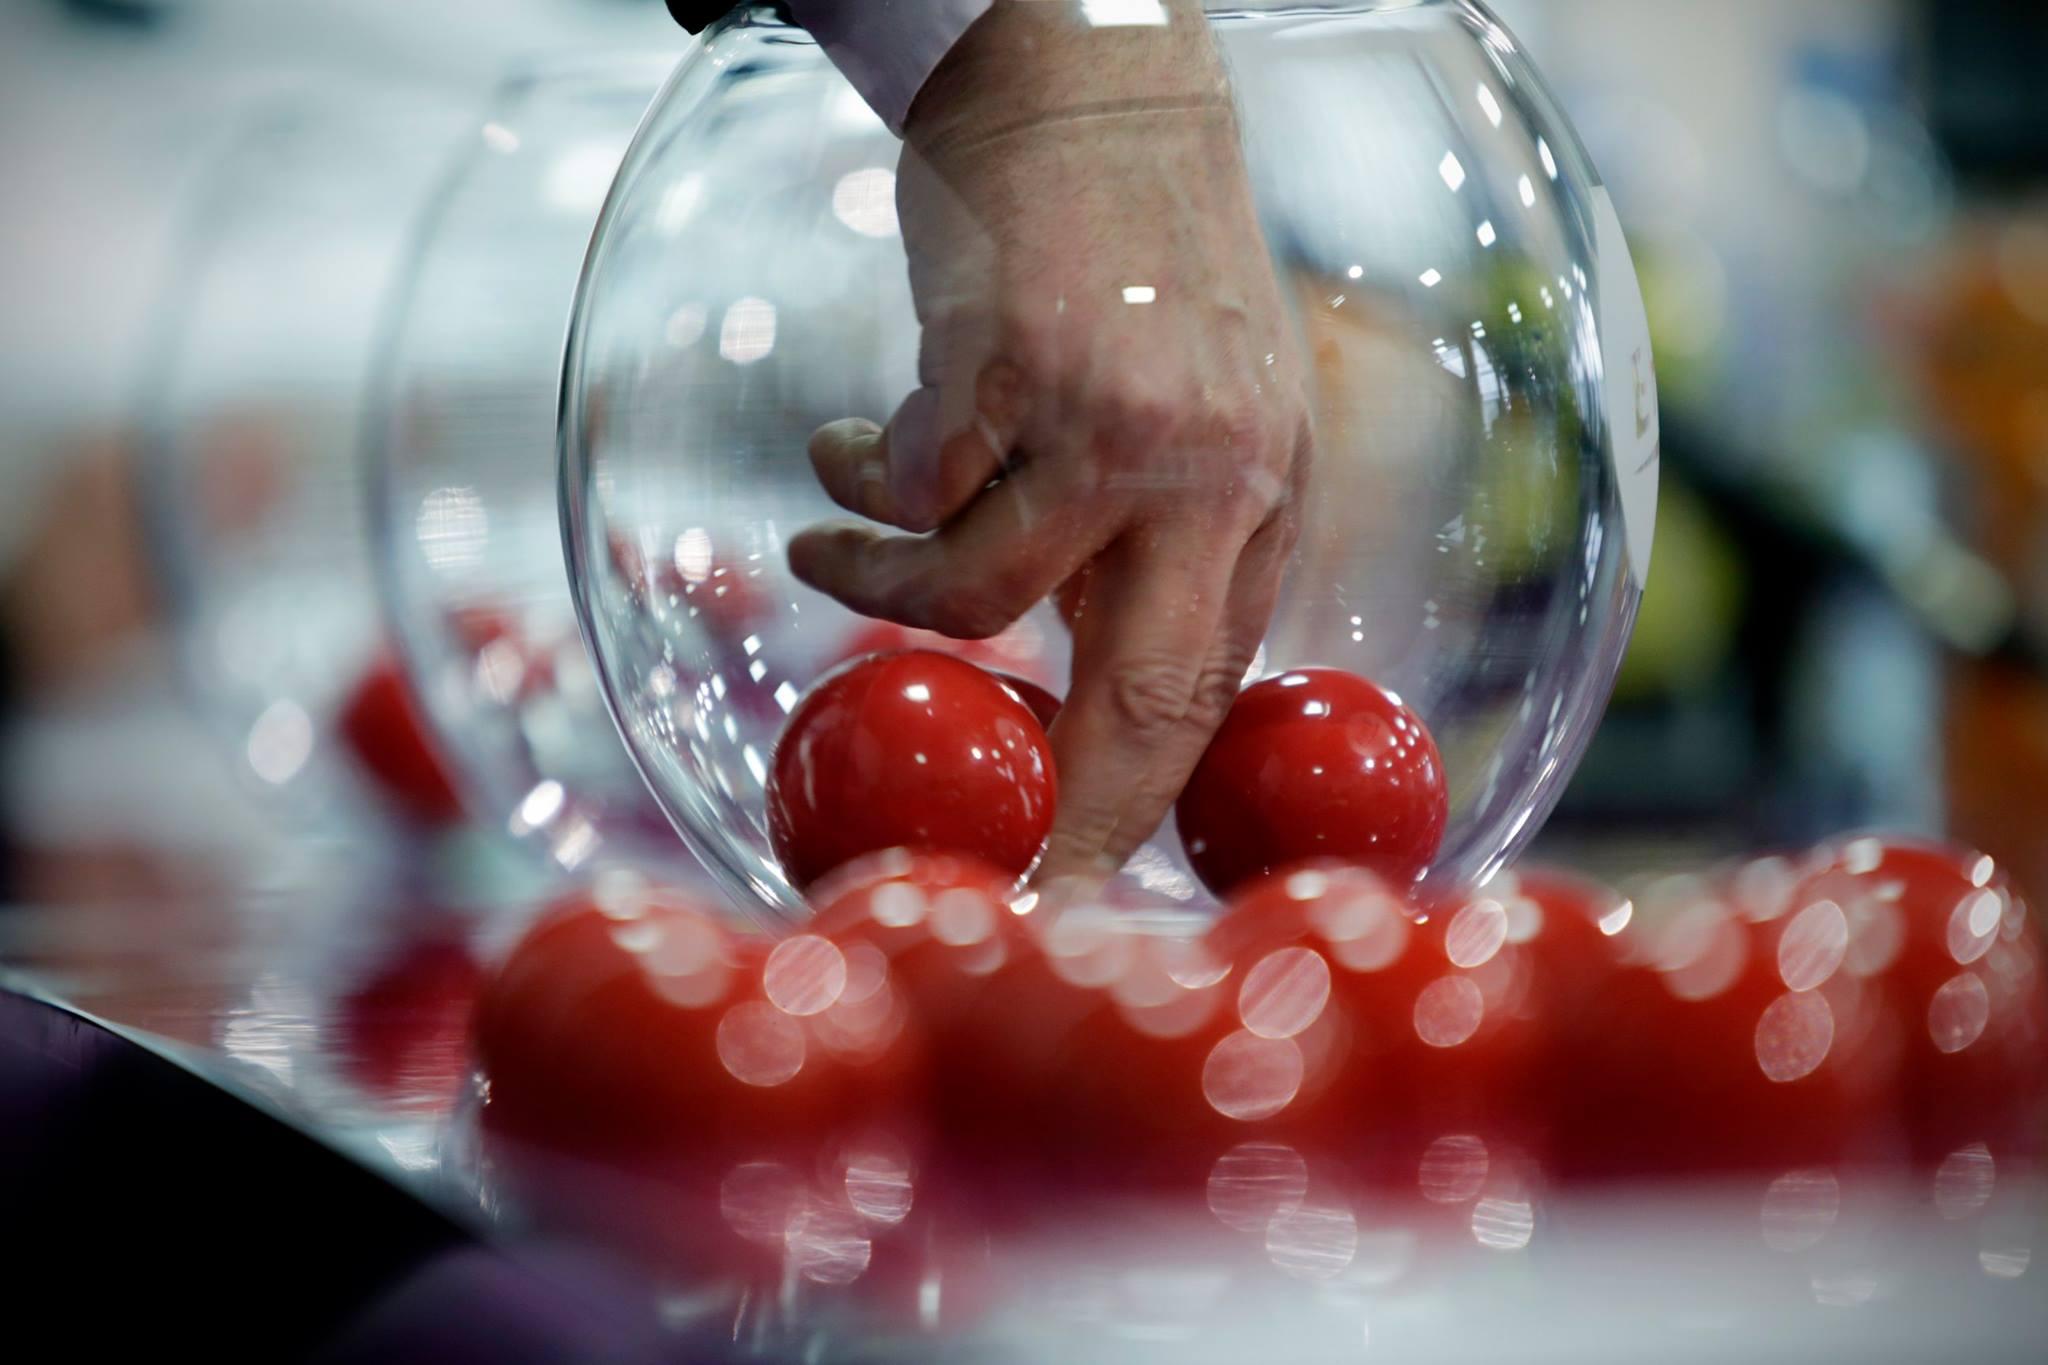 sorteggiati-i-sette-gironi-del-xv-trofeo-caroli-hotels-under-14-giovanissimi-8-13-febbraio-2018